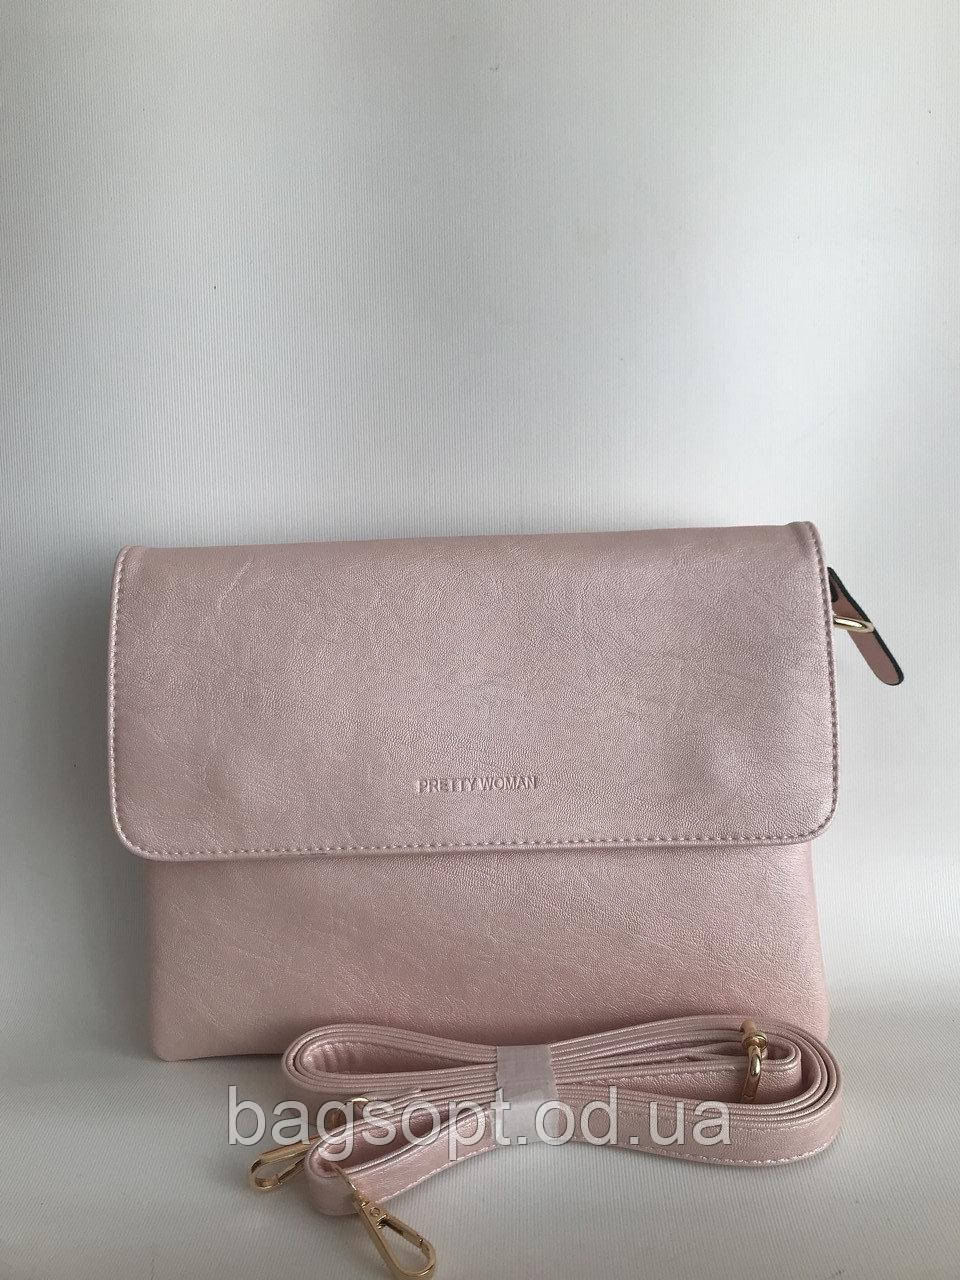 Сумка-клатч розового цвета через плечо Pretty Woman женские сумки весна-лето Одесса 7 км